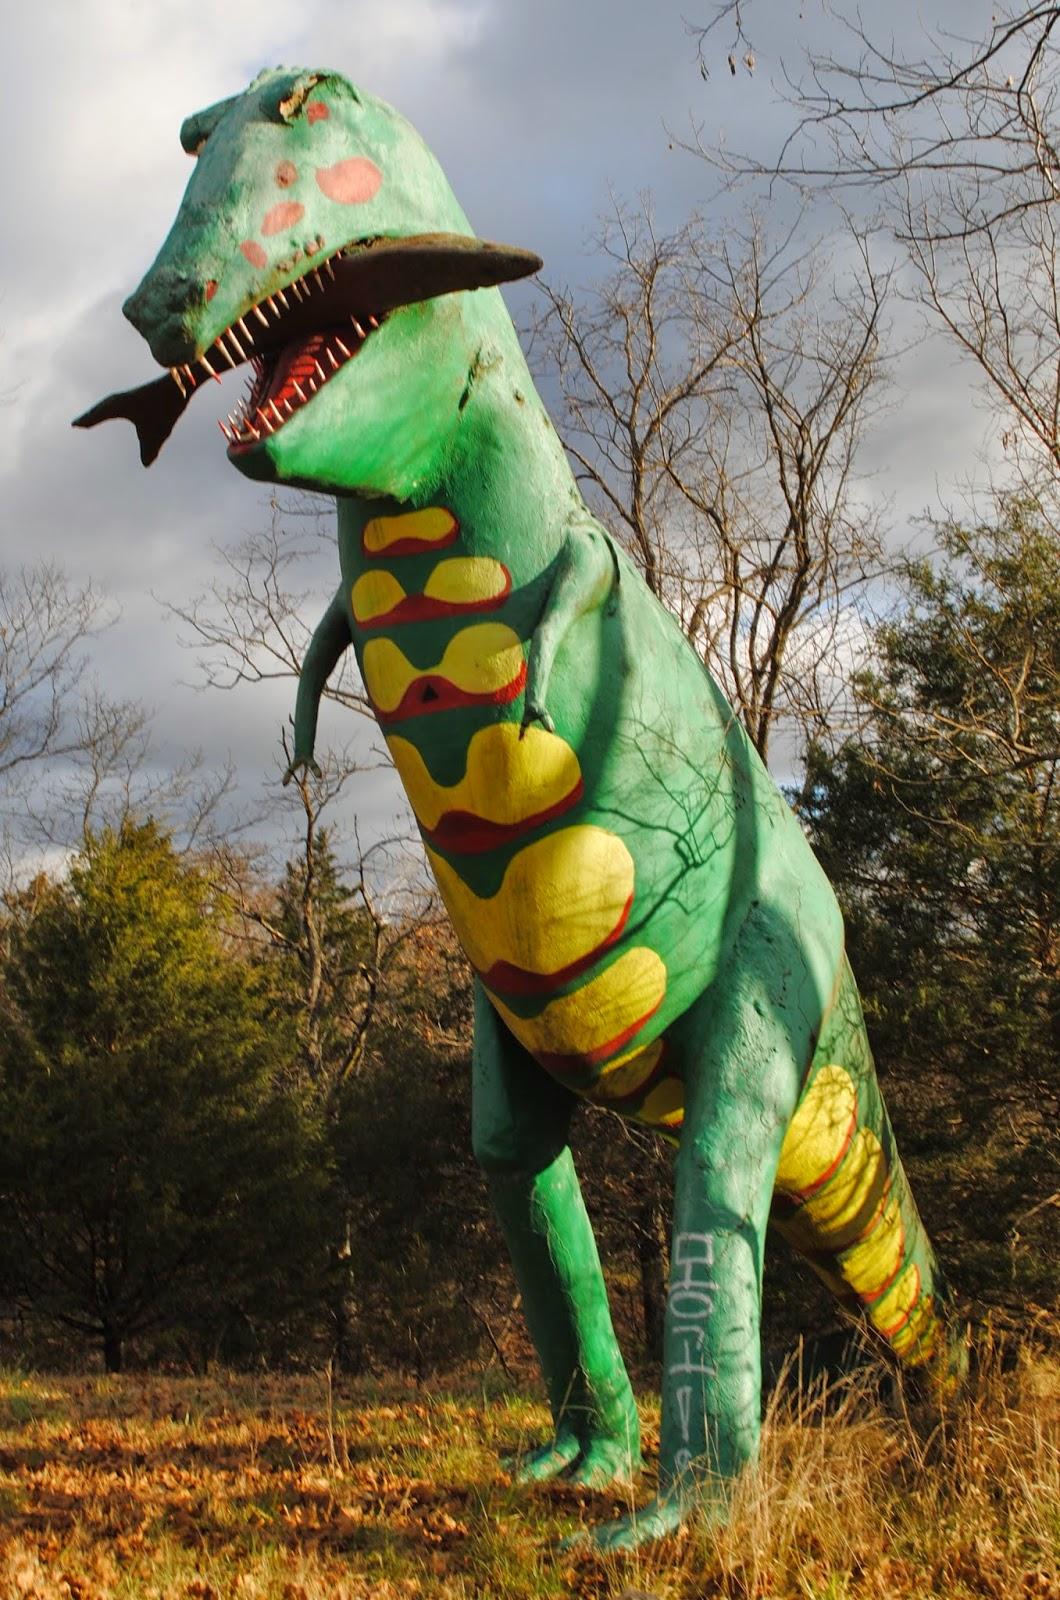 Dinosaur Park Arkansas : dinosaur, arkansas, Carpetbagger:, Dinosaur, World/John, Agar's, Kong:, Abandoned, Wonderland